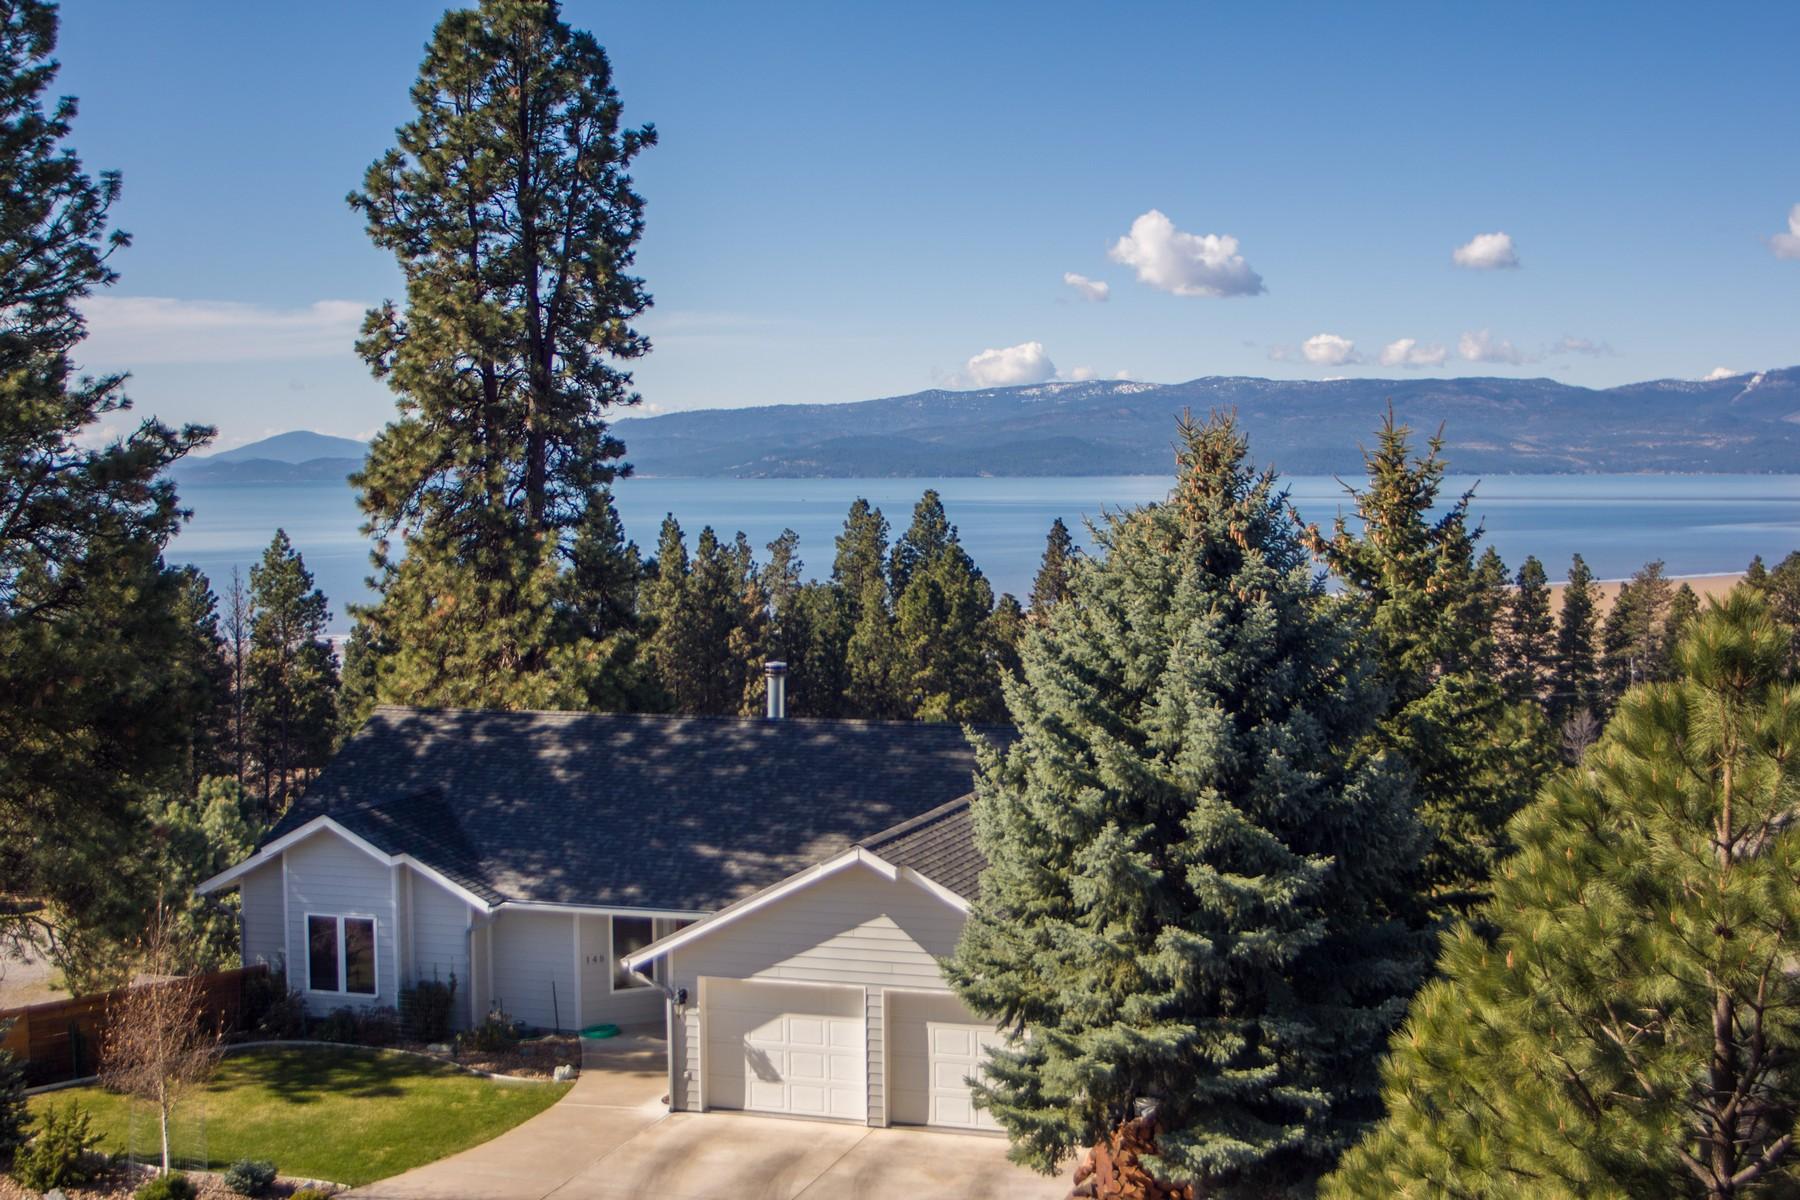 Single Family Home for Sale at Bigfork Rancher 148 S. Crestview Terrace Bigfork, Montana 59911 United States